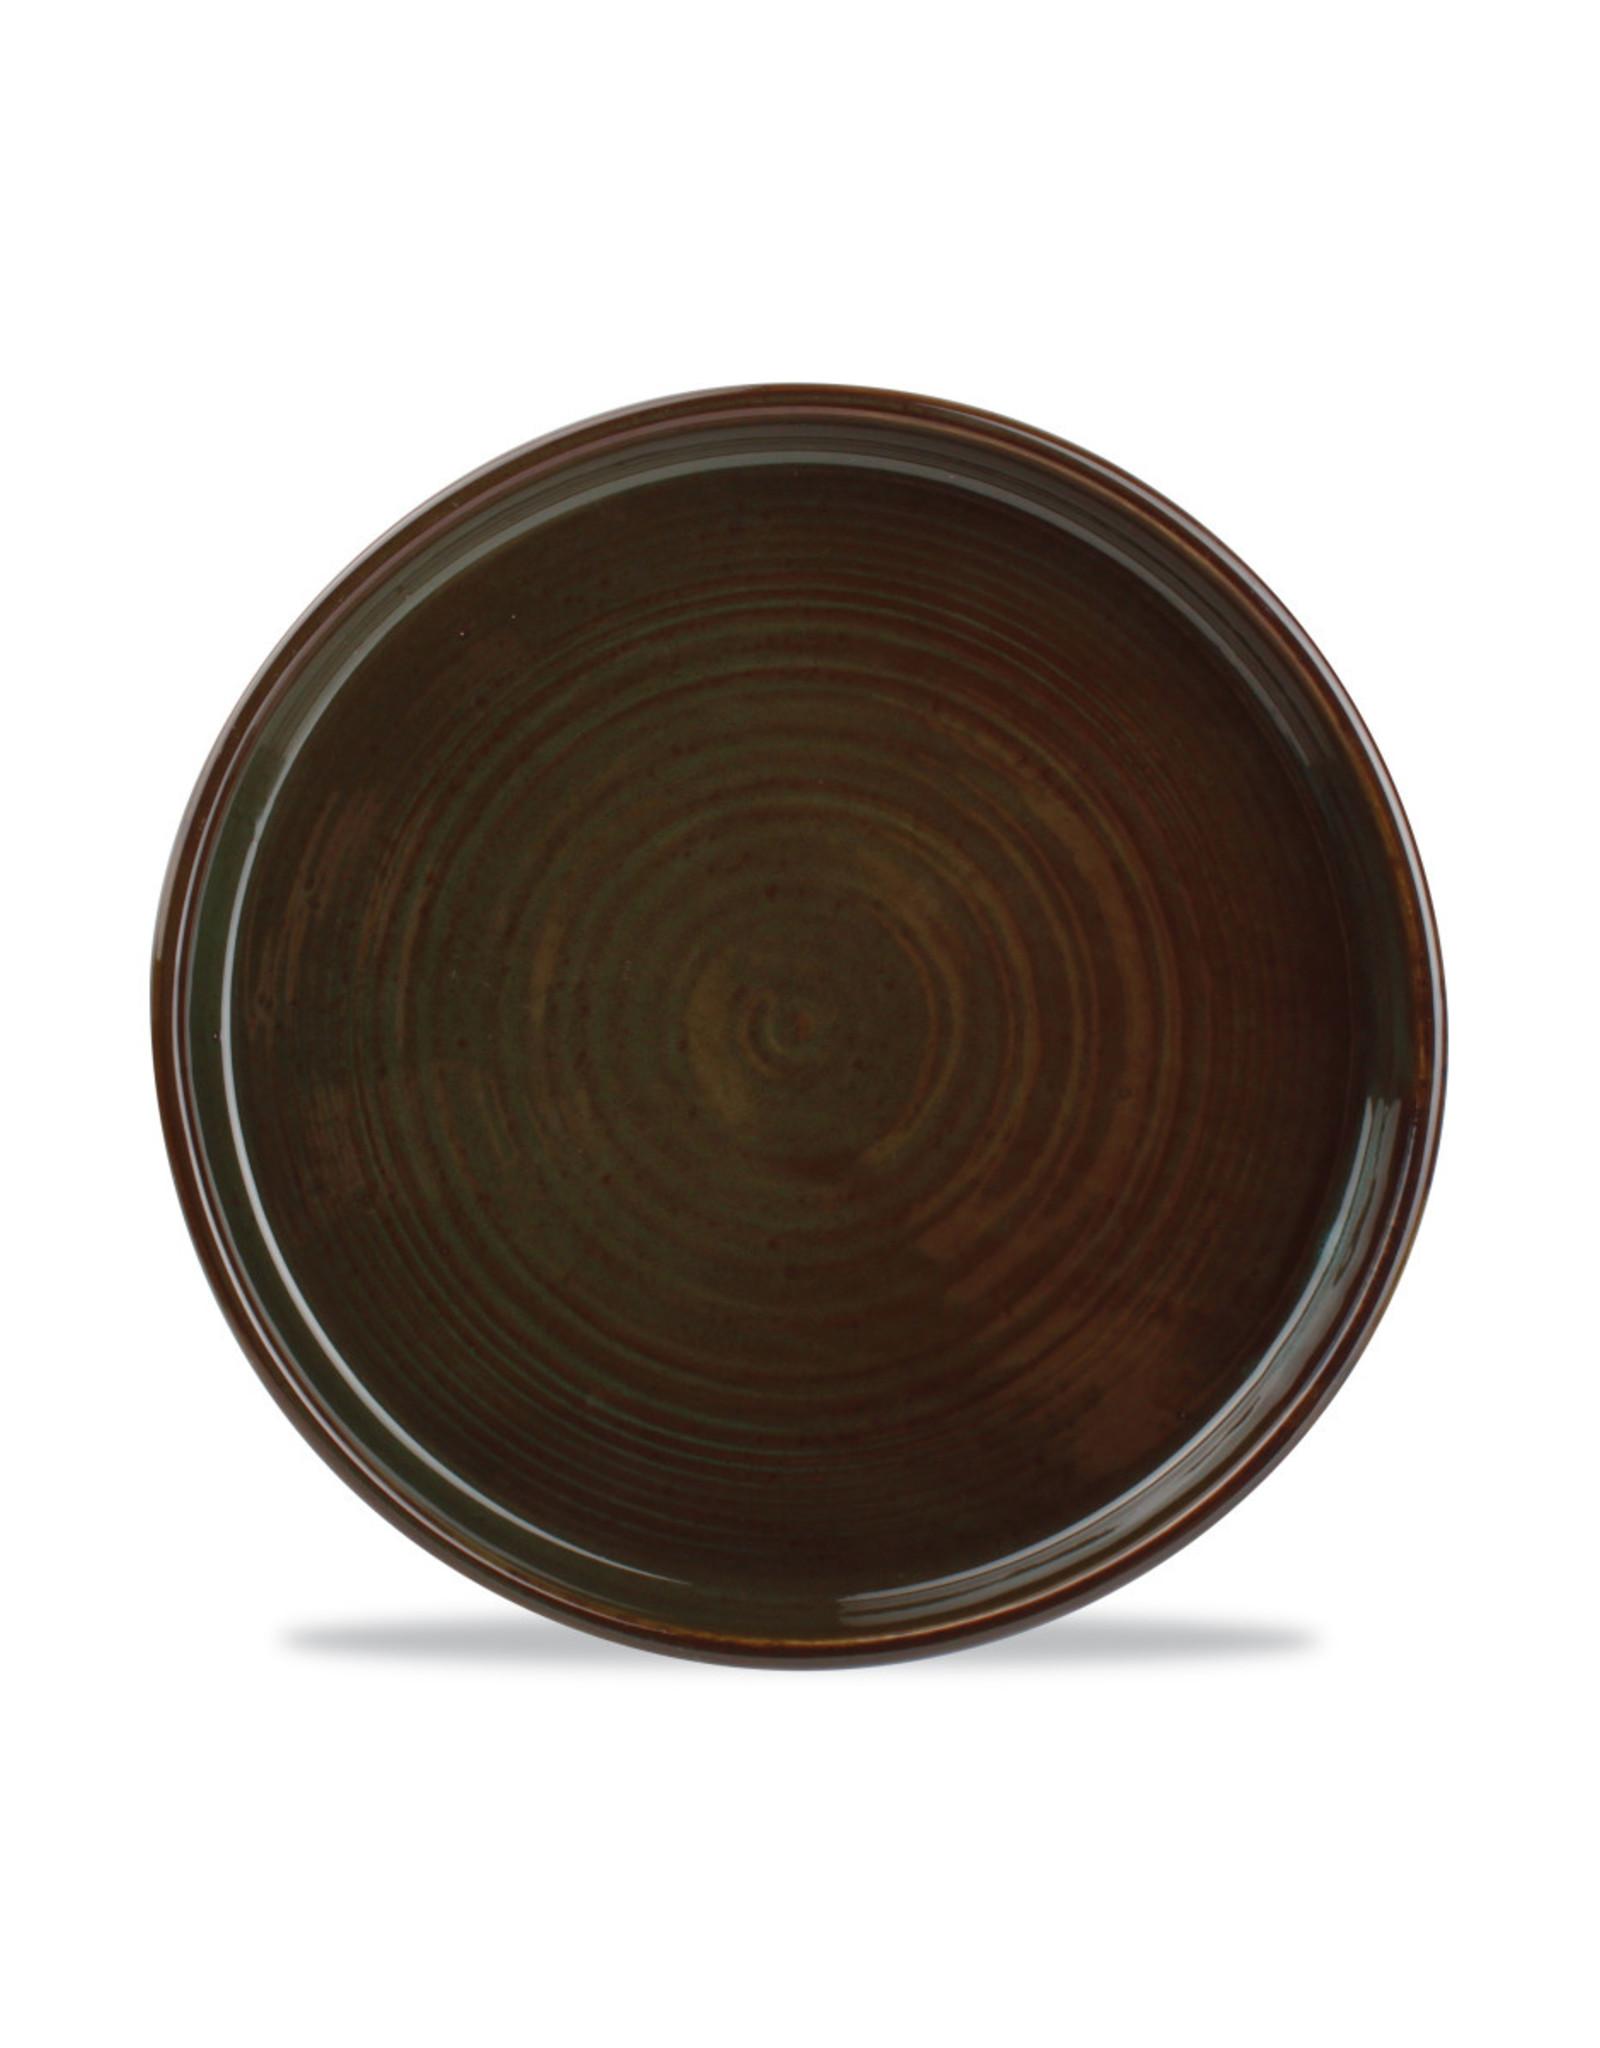 Bord 17.5 x 2.5 cm opst rand Green/Brown